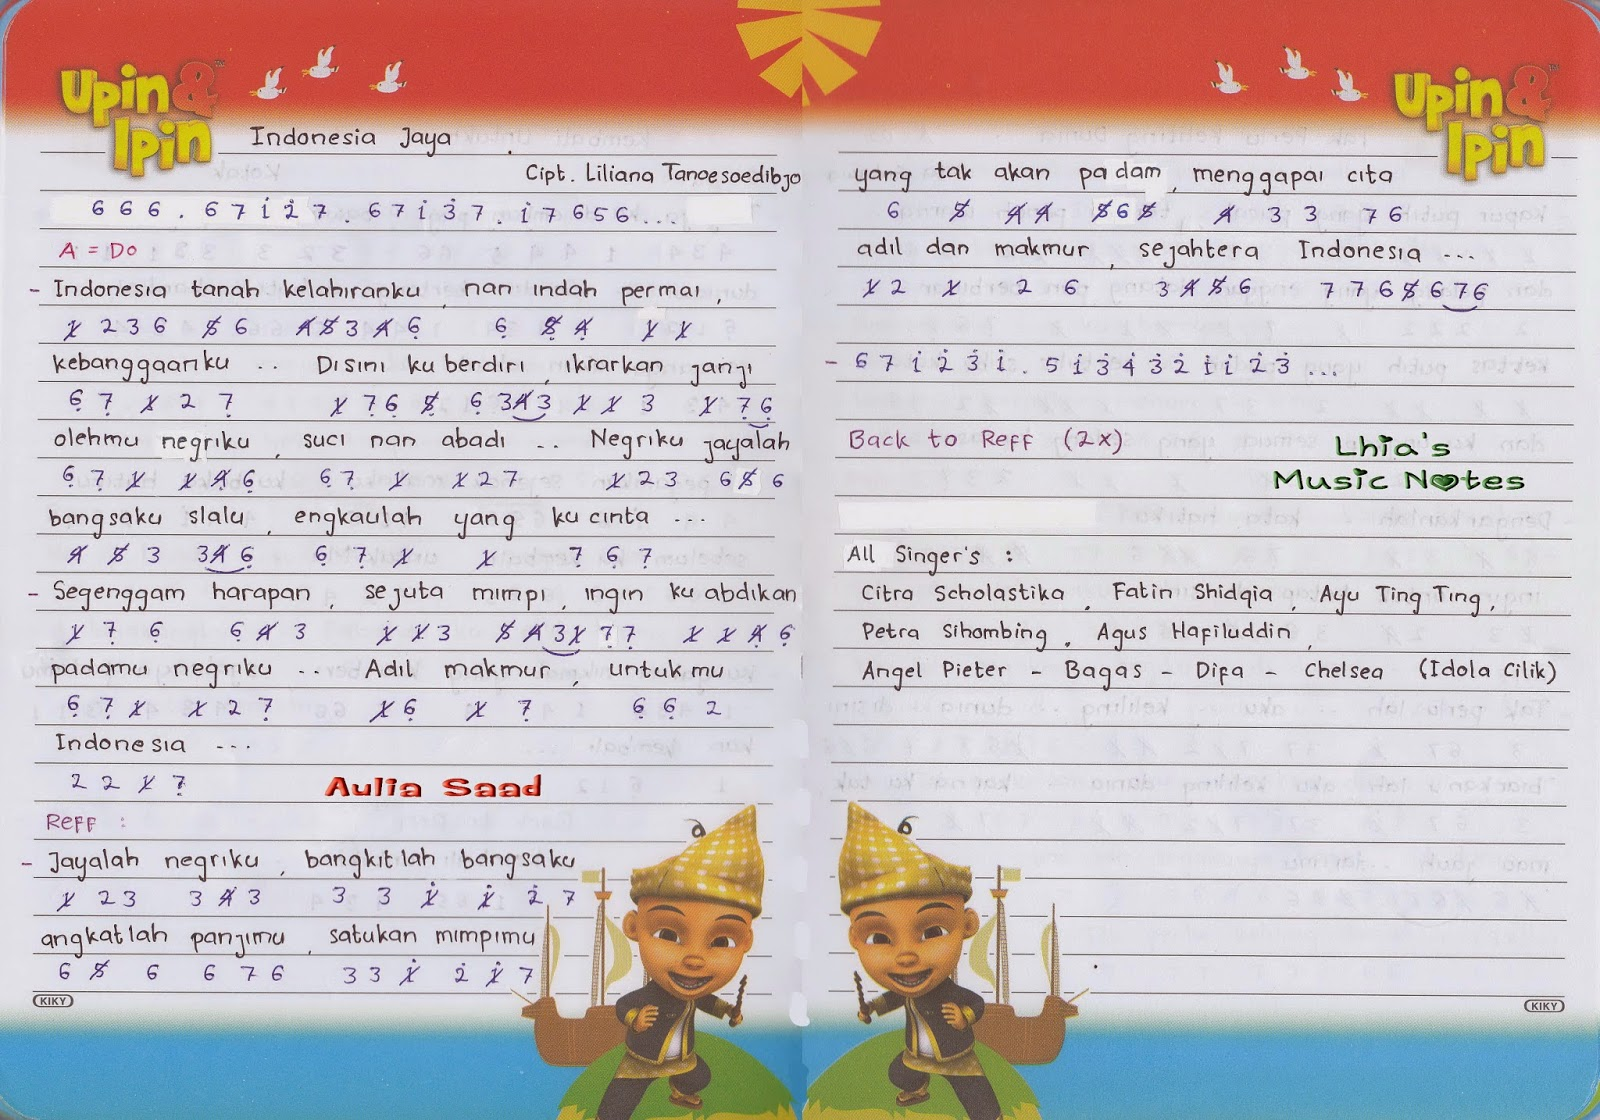 Not Angka Lagu Indonesia Jaya Cipt Liliana Tanoesoedibjo Lhia S Music Notes